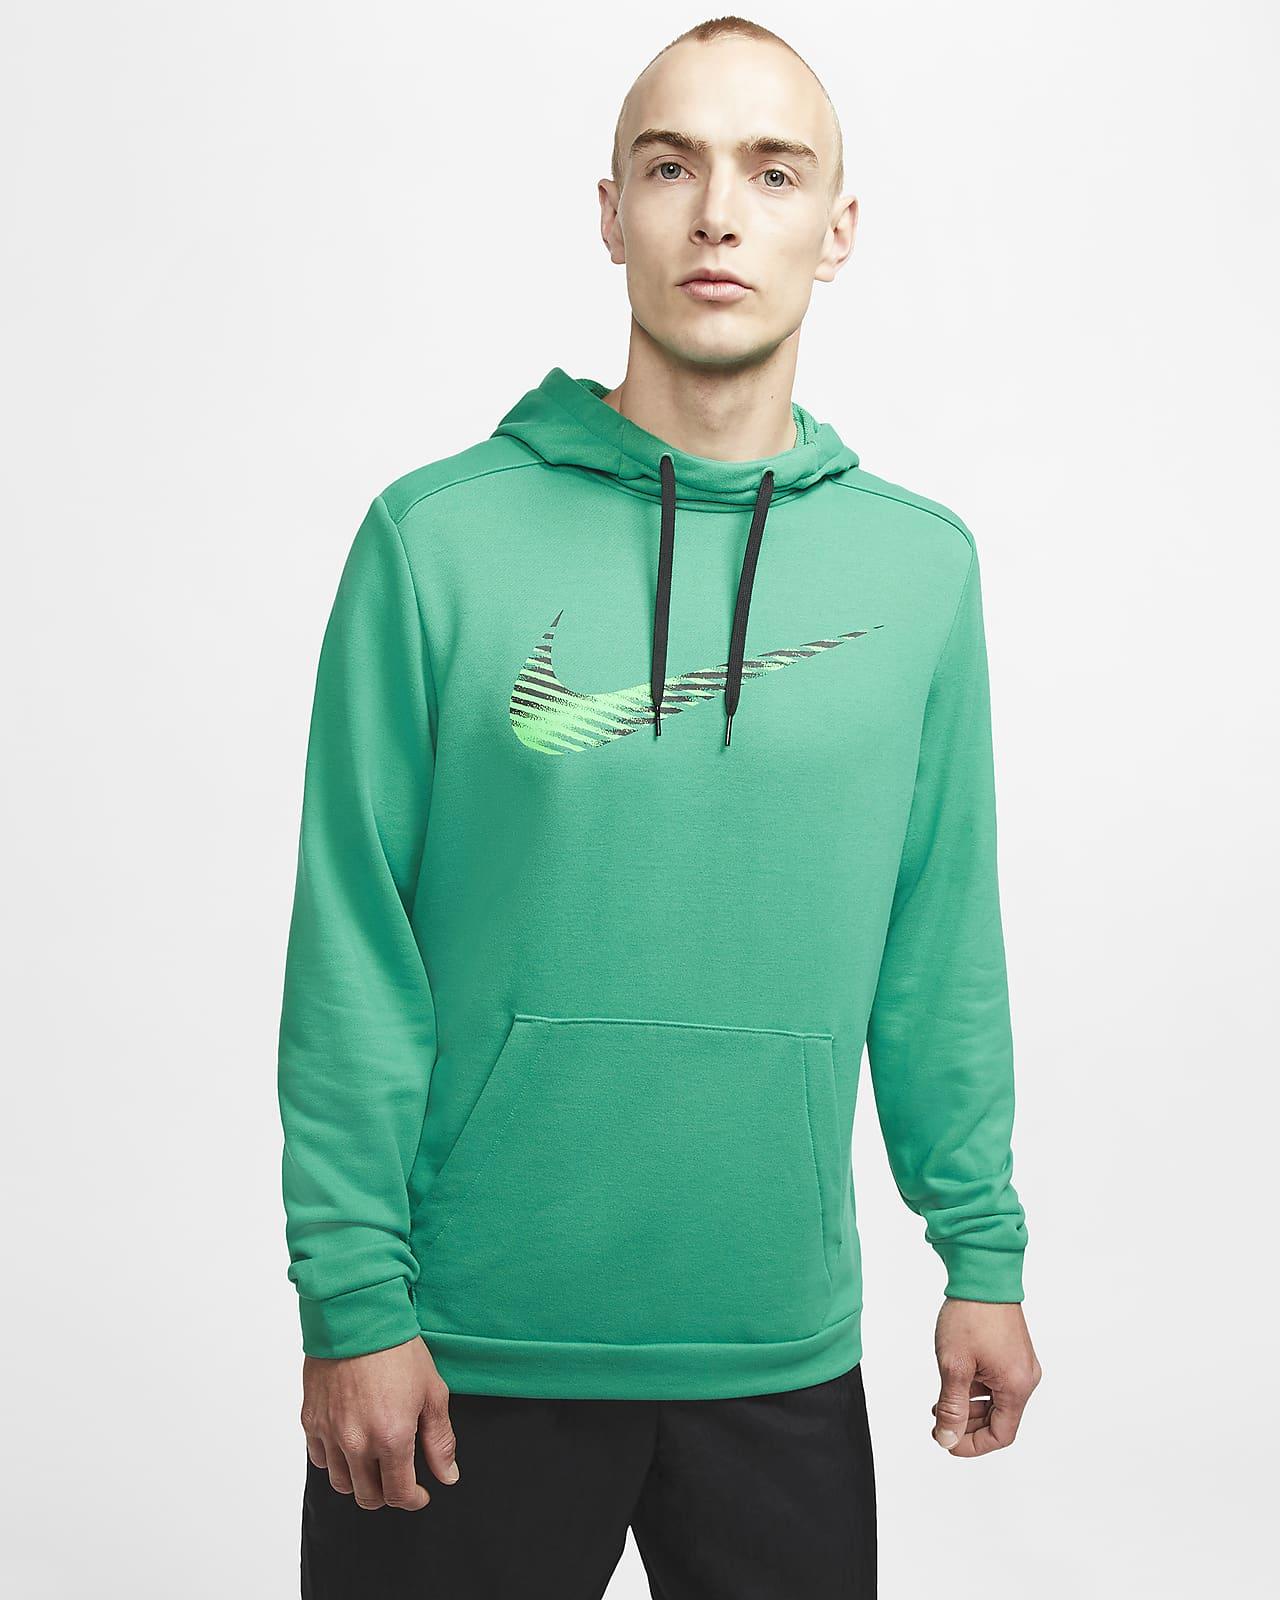 Nike Dri FIT Men's Pullover Training Hoodie